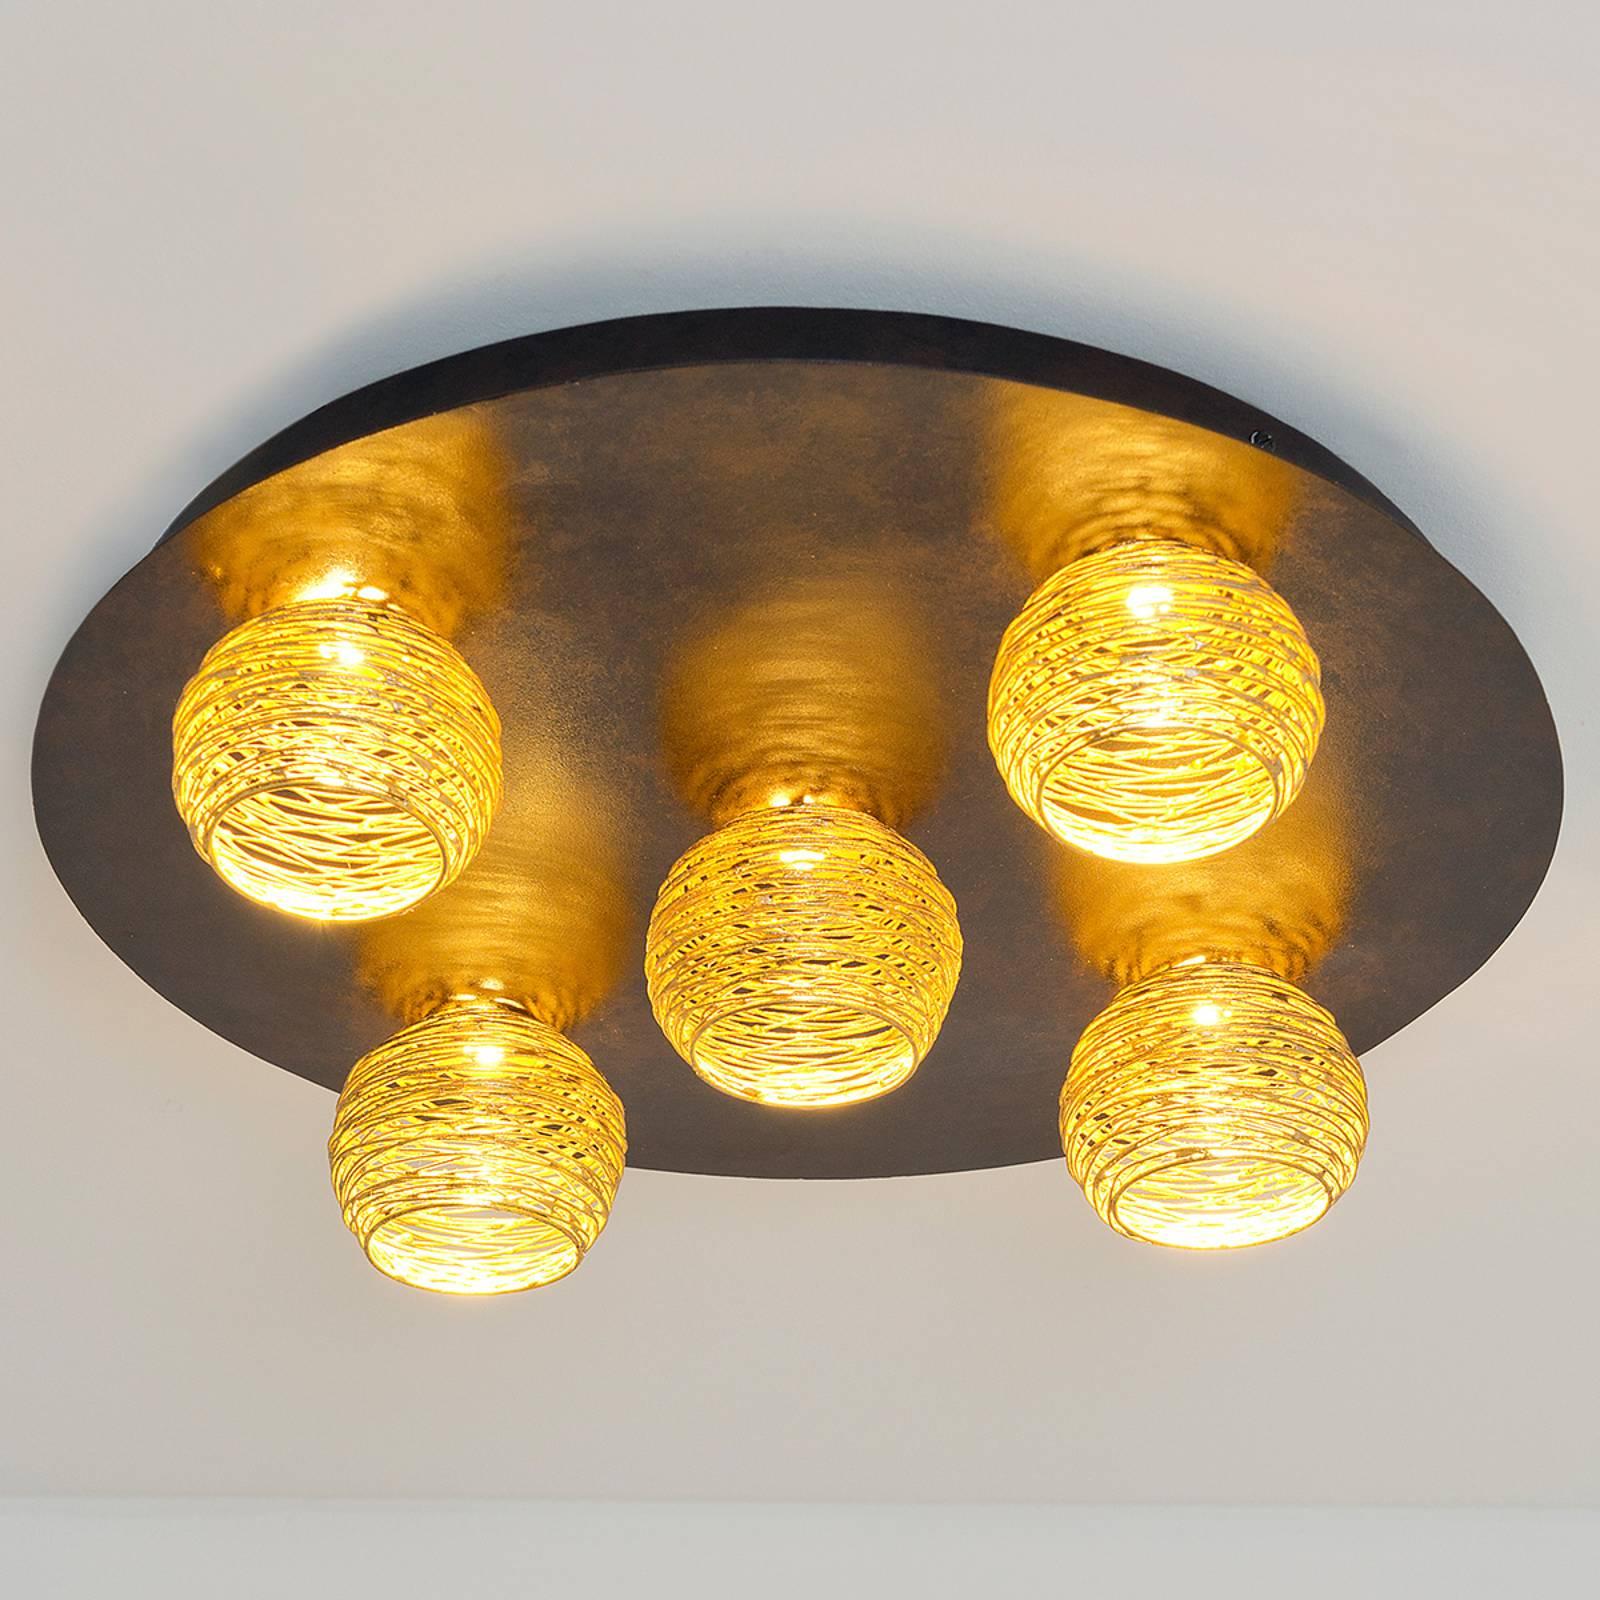 Plafondlamp Carillon met gouden kappen